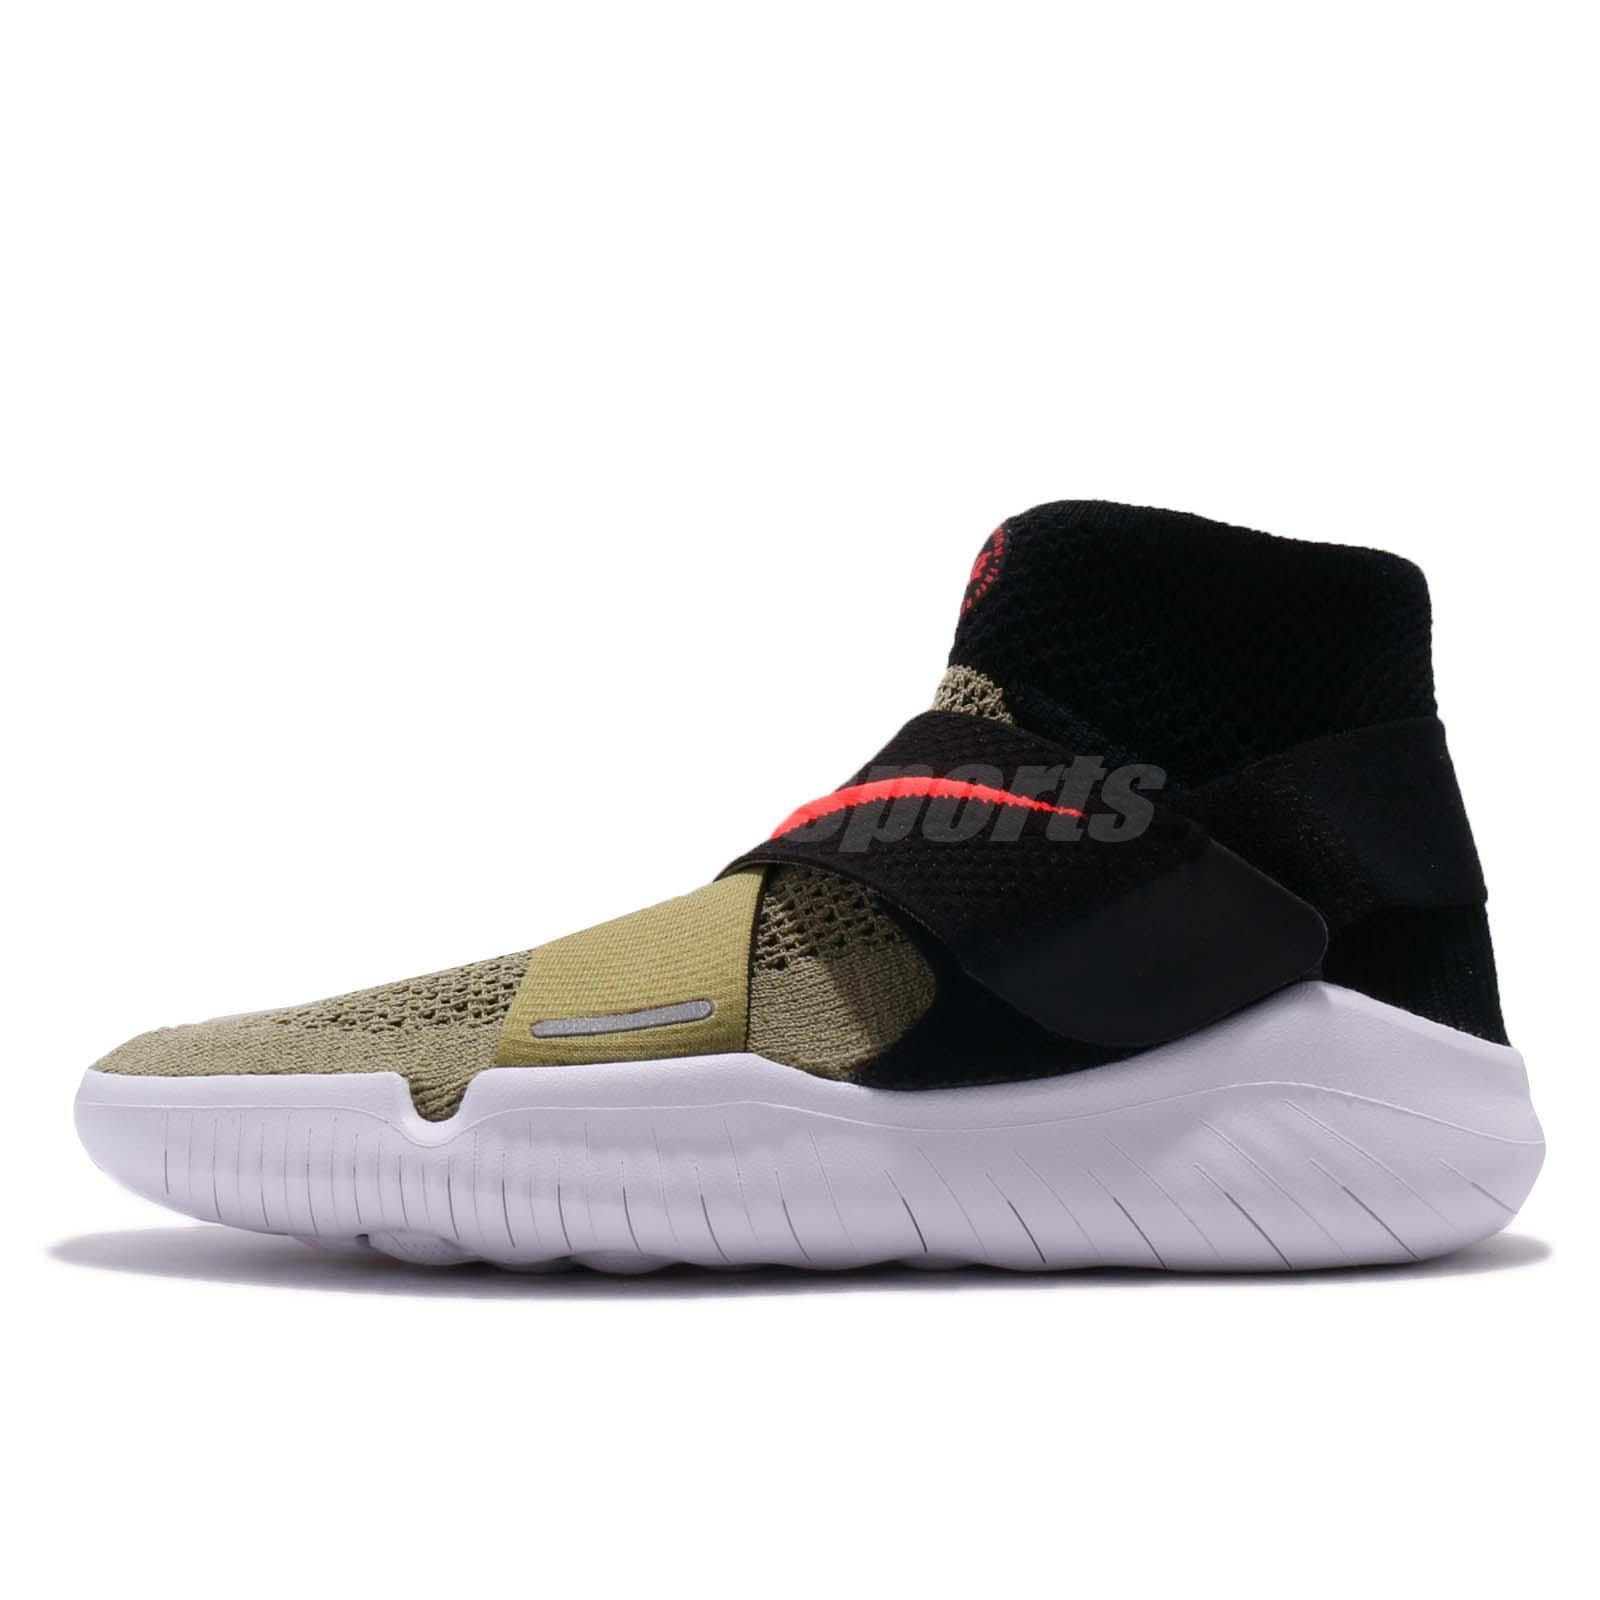 Nike Free RN Motion FK 2018 Run Flyknit Olive Green Men Running Shoe  942840-200 40548f3fe5137